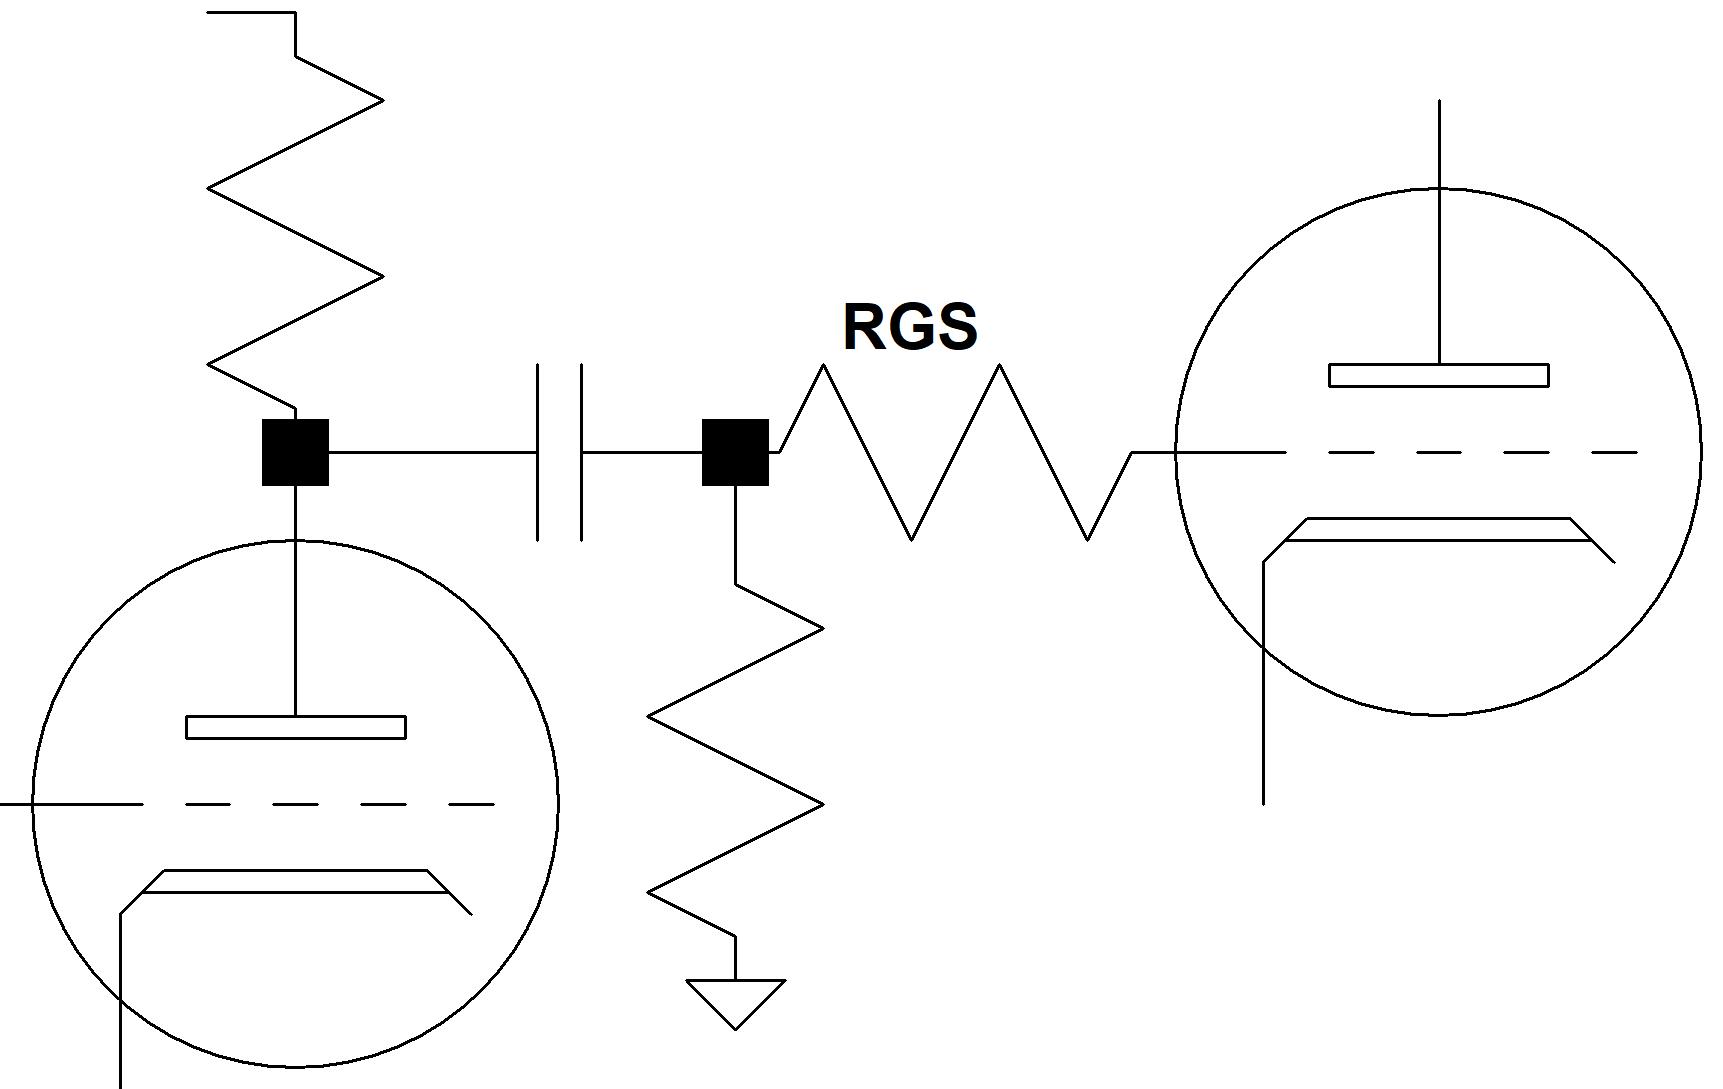 Grid Stopper Resistor Calculator Fender Bassman 5f6 Tweed Guitar Effect Schematic Diagram Amp Circuit